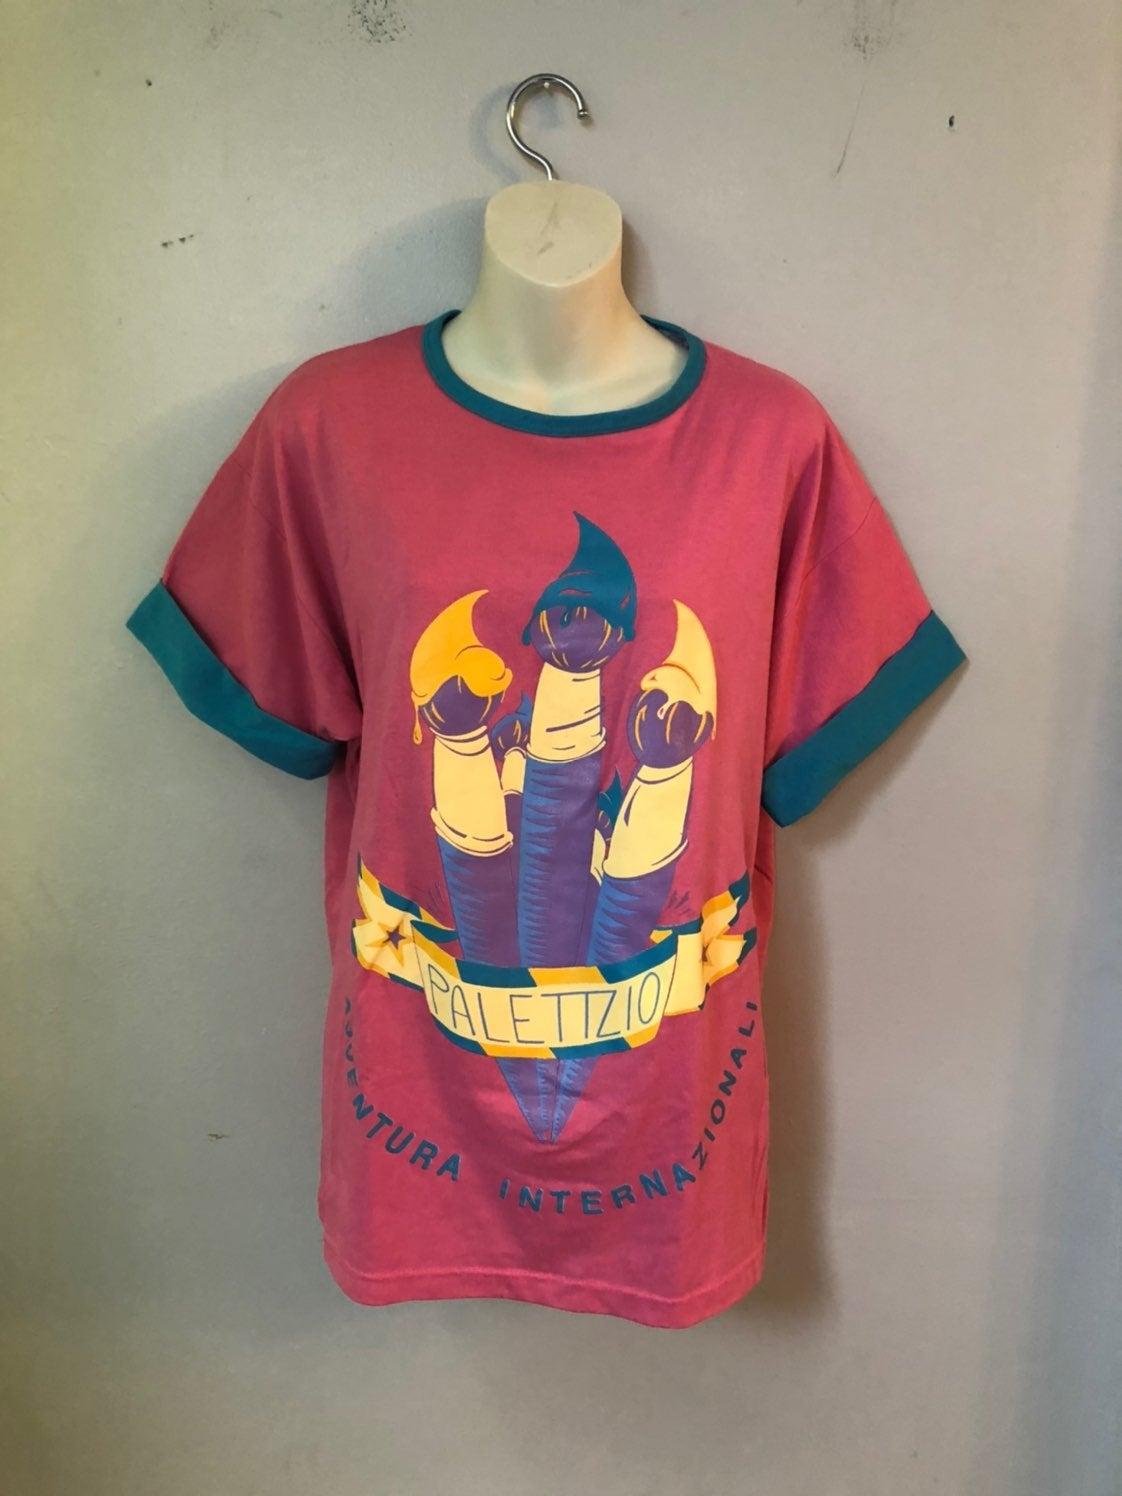 1980s shirt rare palettzii L great shape